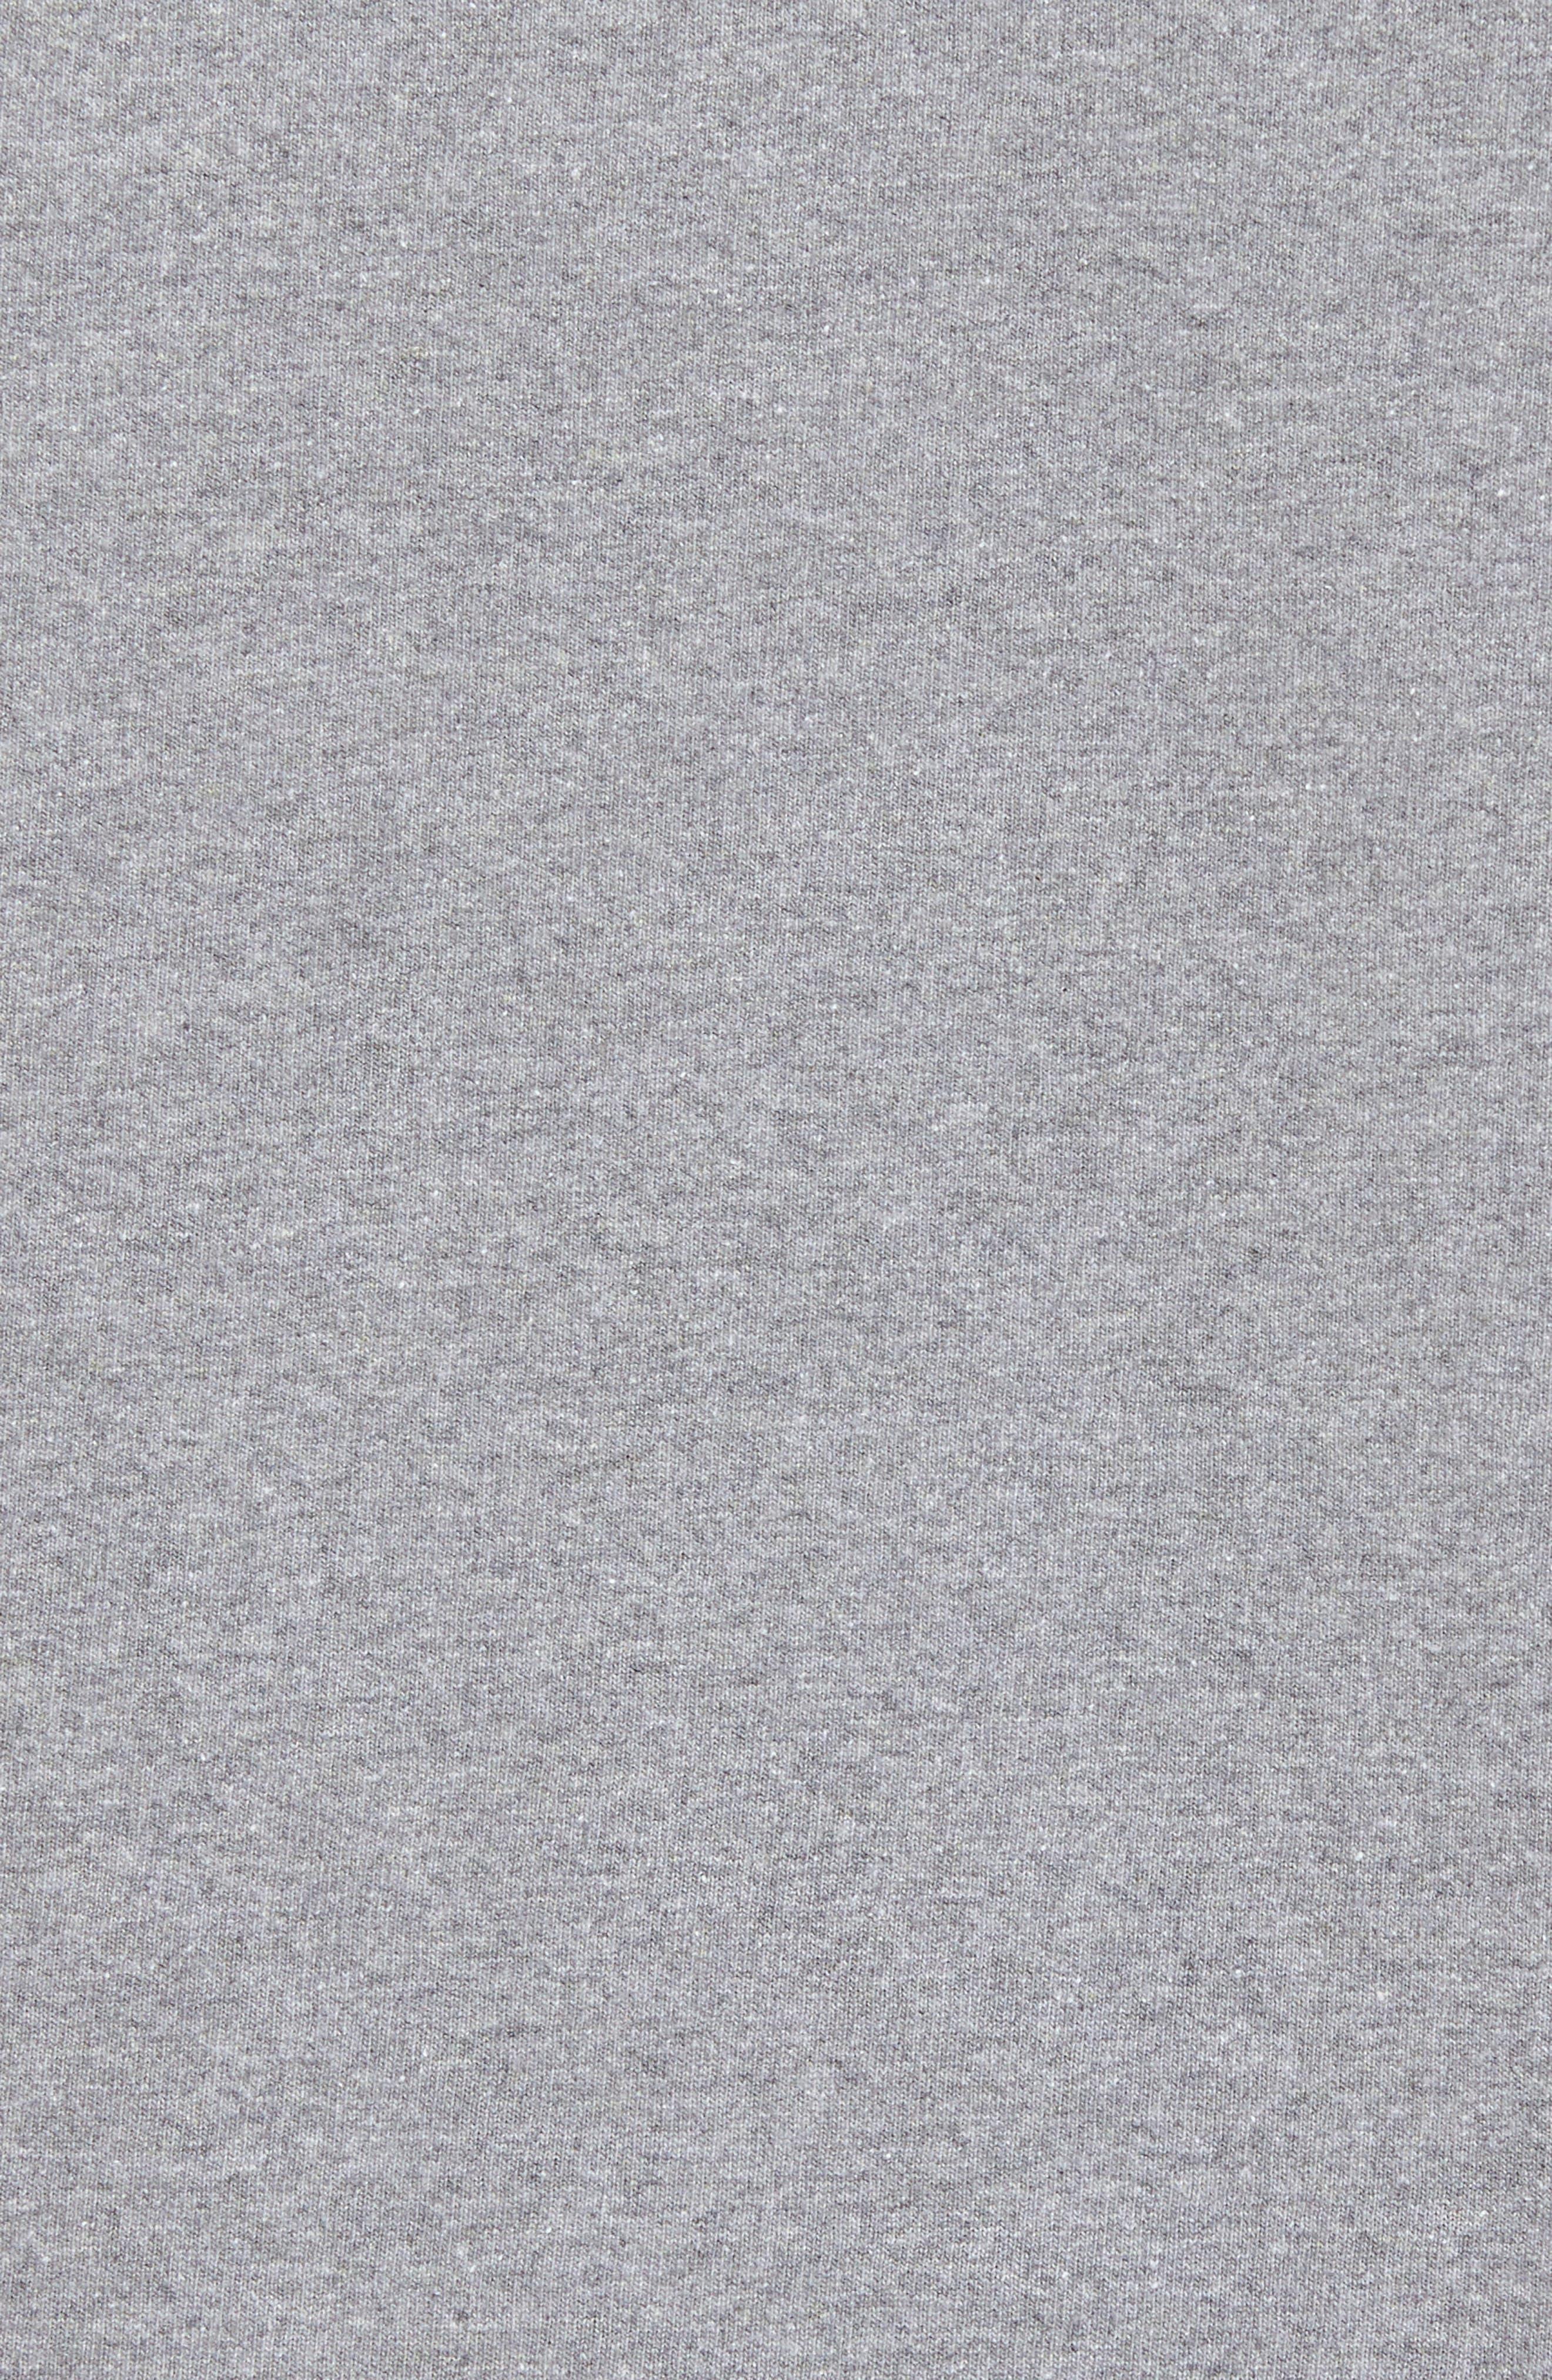 PATAGONIA, Responsibili-Tee T-Shirt, Alternate thumbnail 5, color, GRAVEL HEATHER